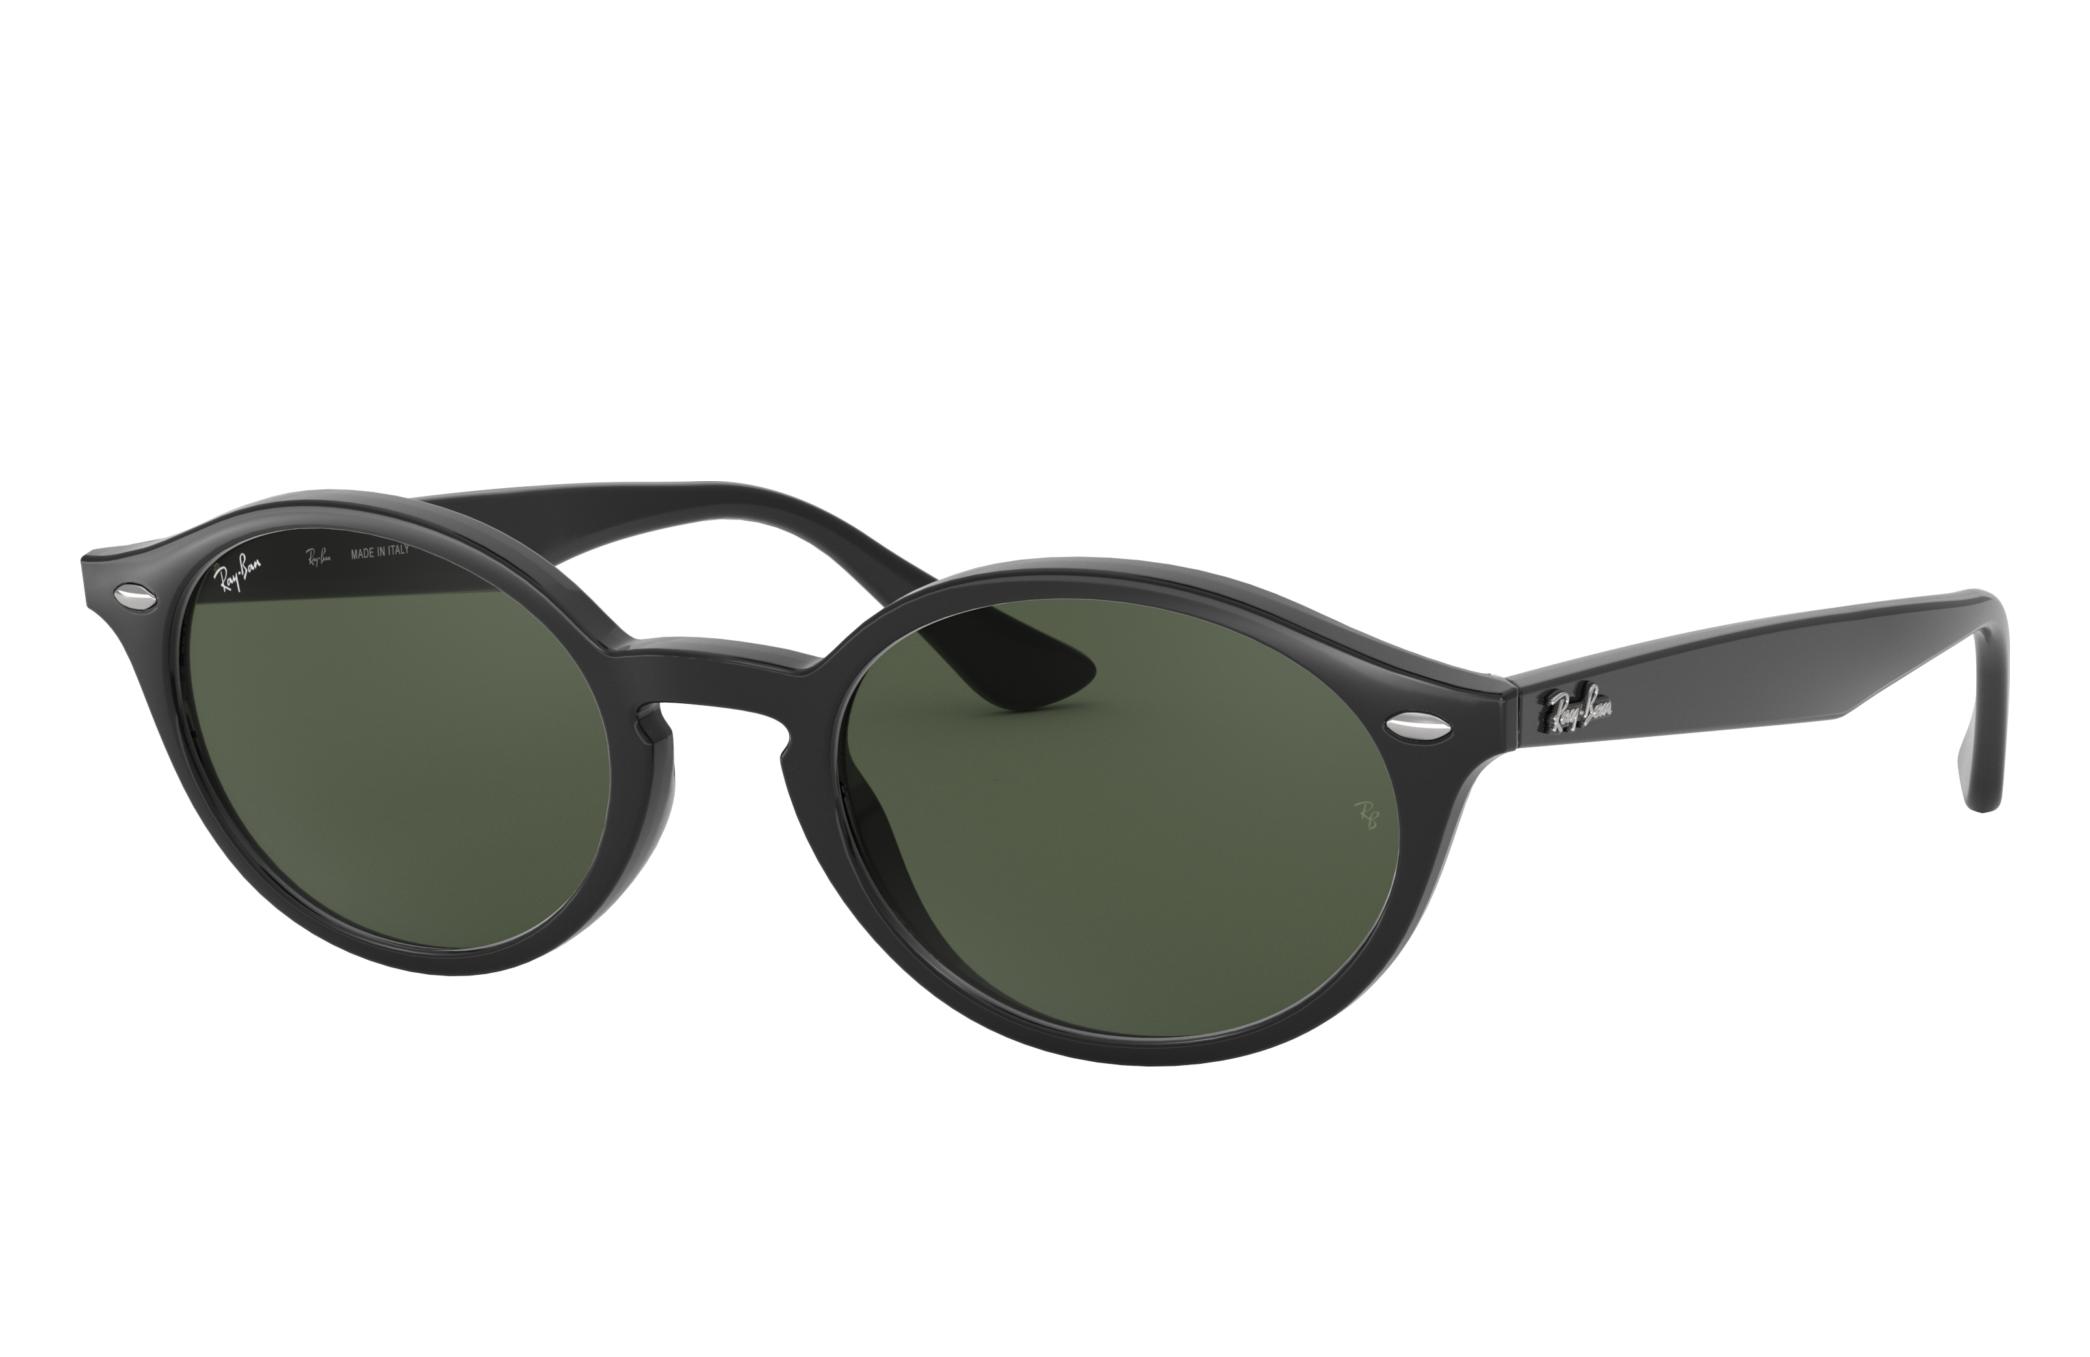 Ray-Ban Rb4315 Black, Green Lenses - RB4315